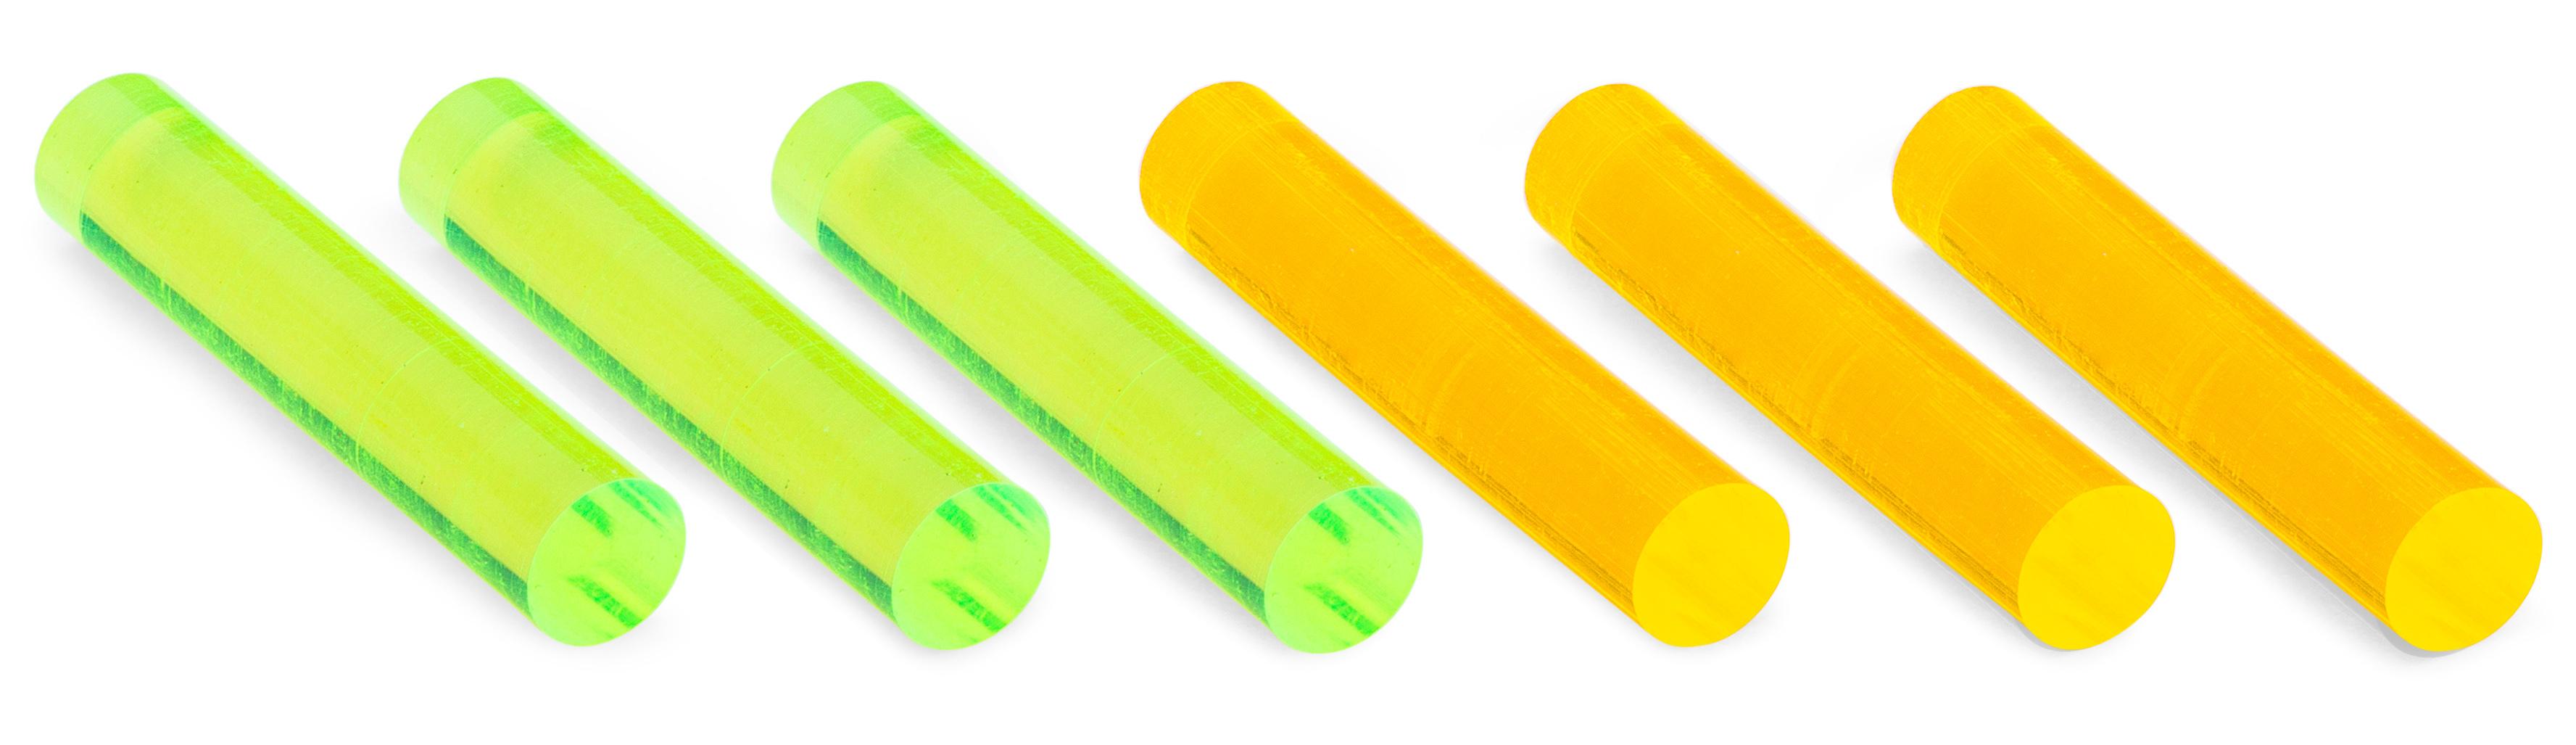 TrijiconDI™ Night Sight Fiber Replacement Pack - MultiColor